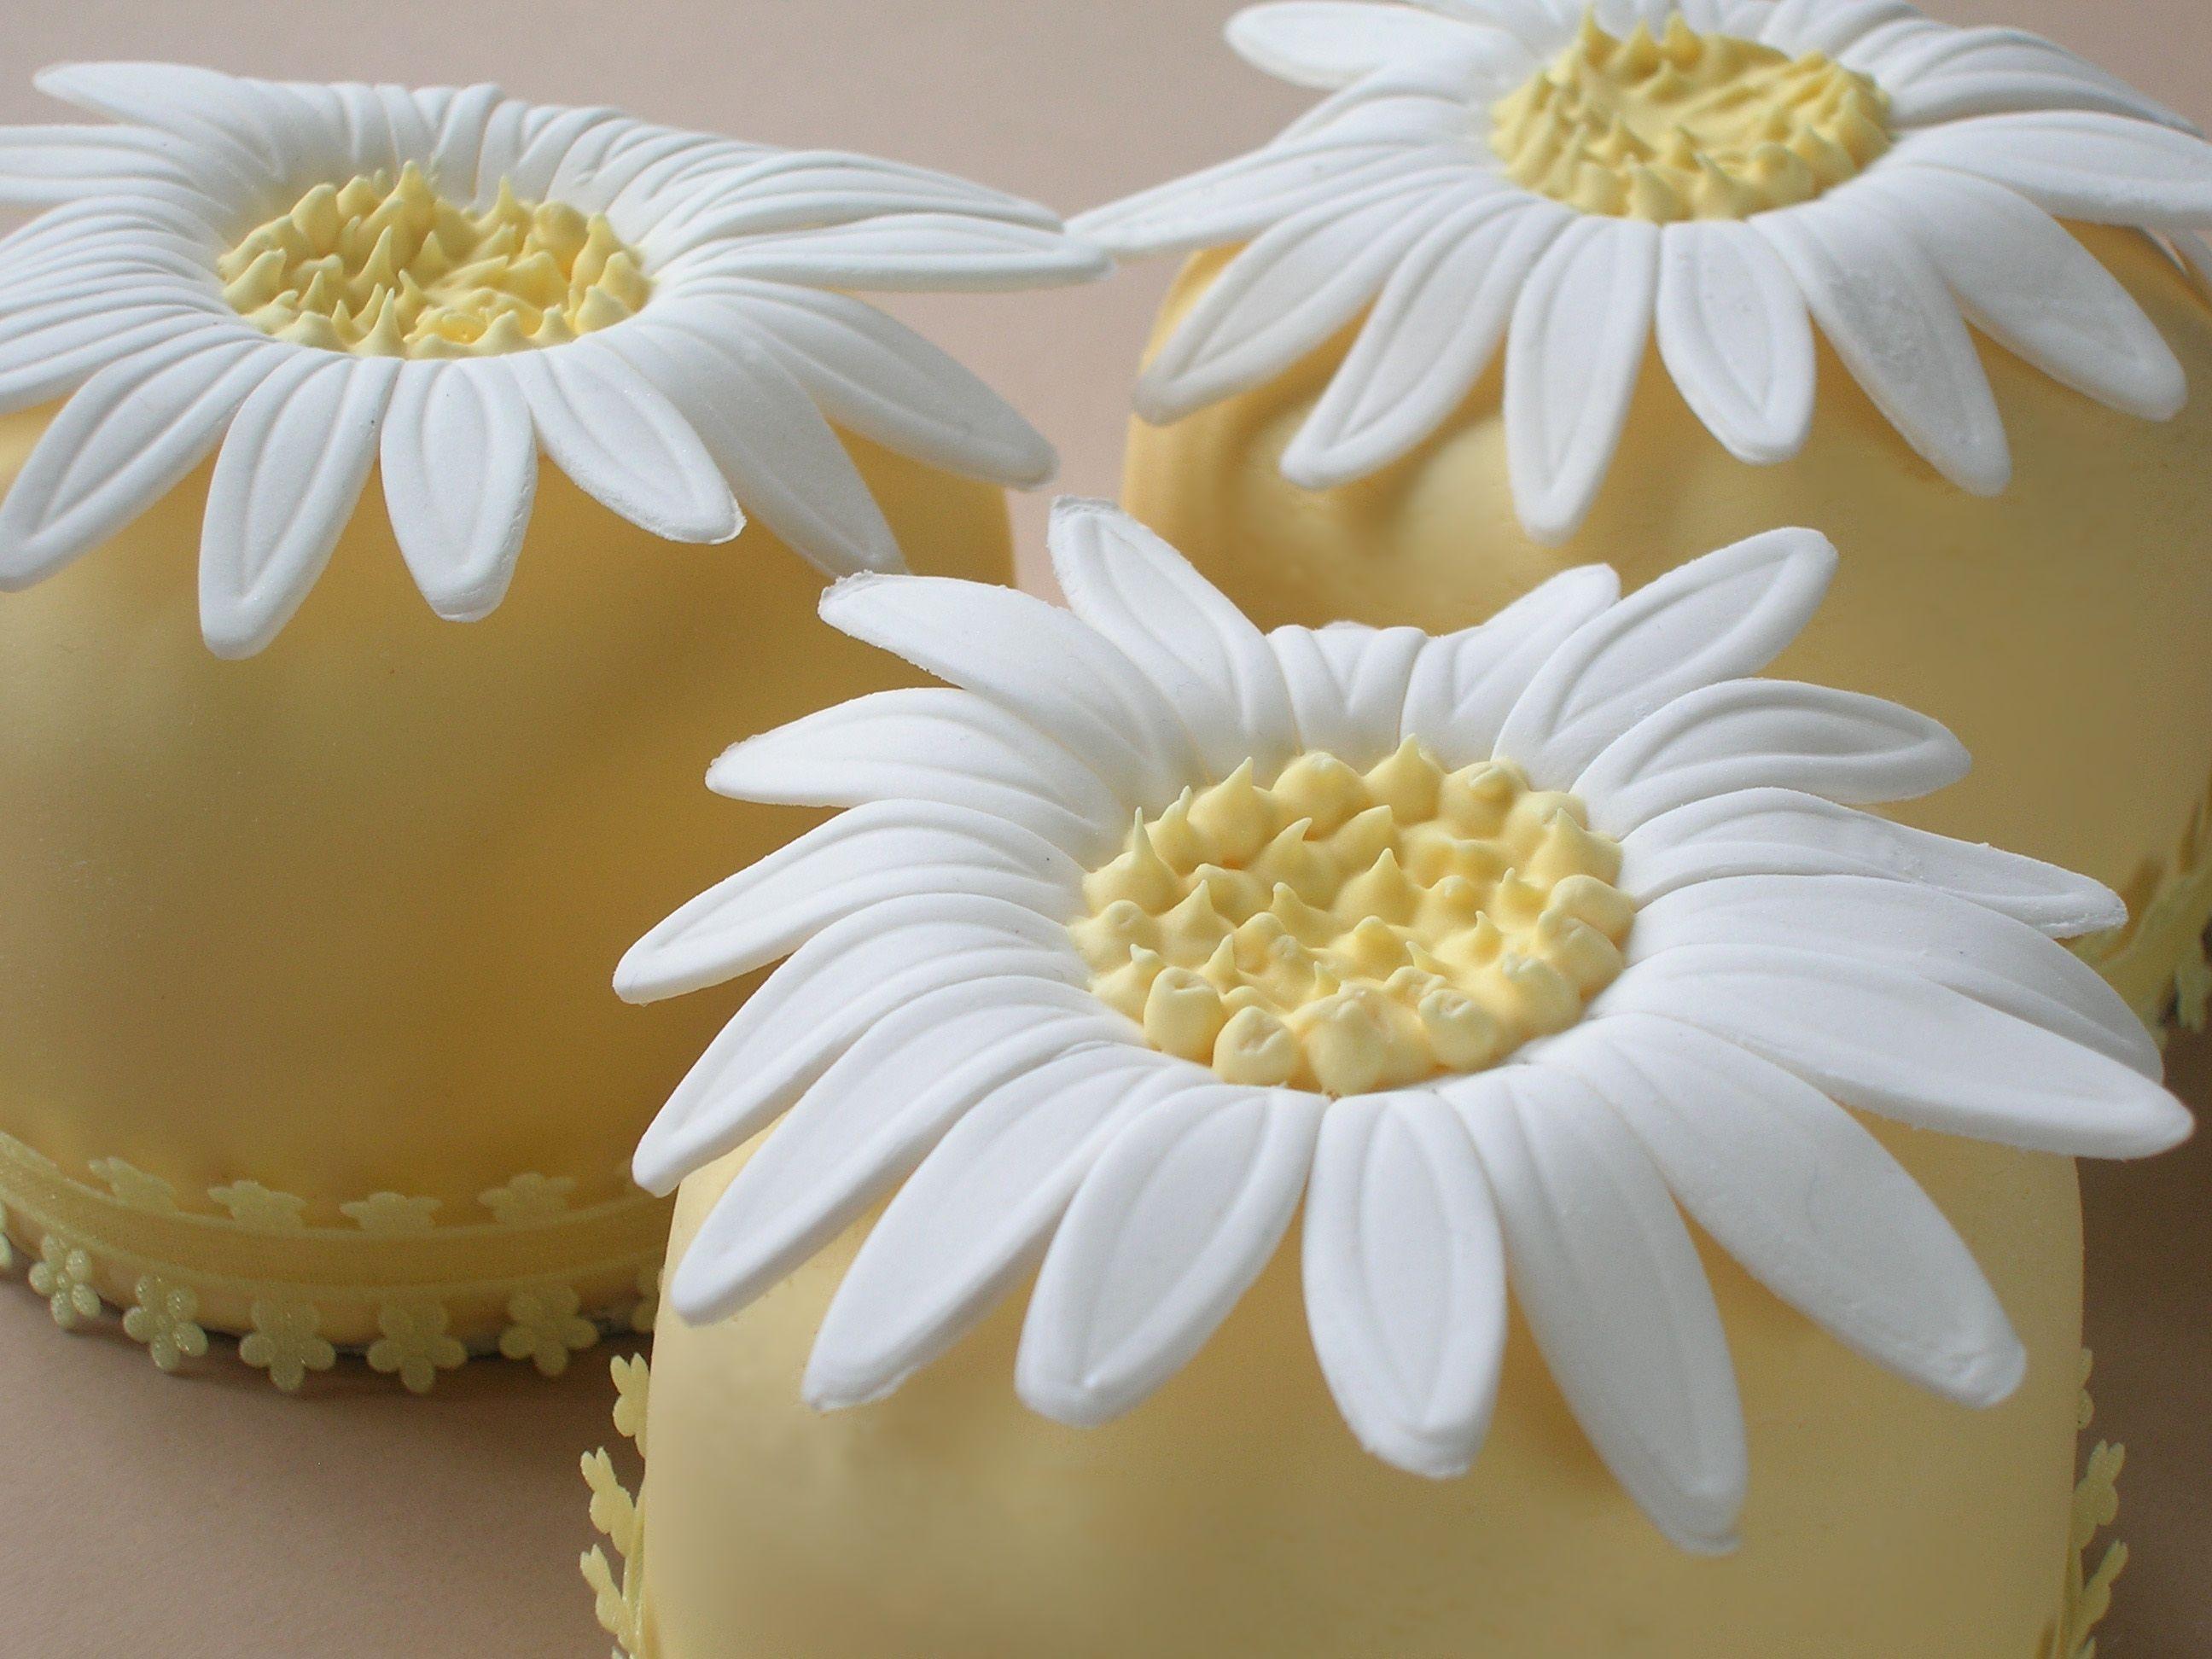 Cake Decorating Classes Grand Rapids Mi : 100+ [ Small Cake Ideas ] Decorating Christmas Cakes ...